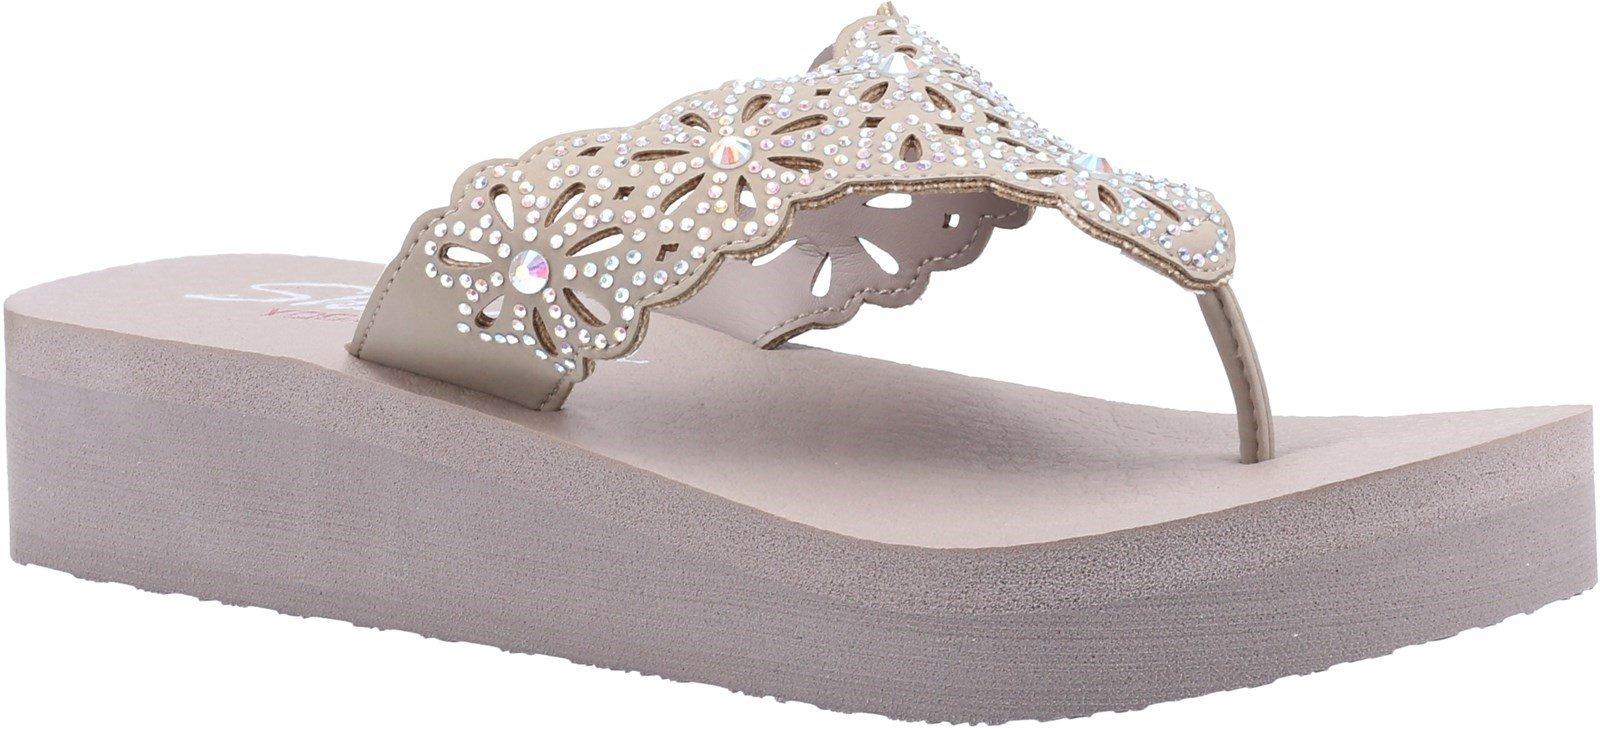 Skechers Women's Vinyasa Pretty Summer Sandal Various Colours 32173 - Taupe 3